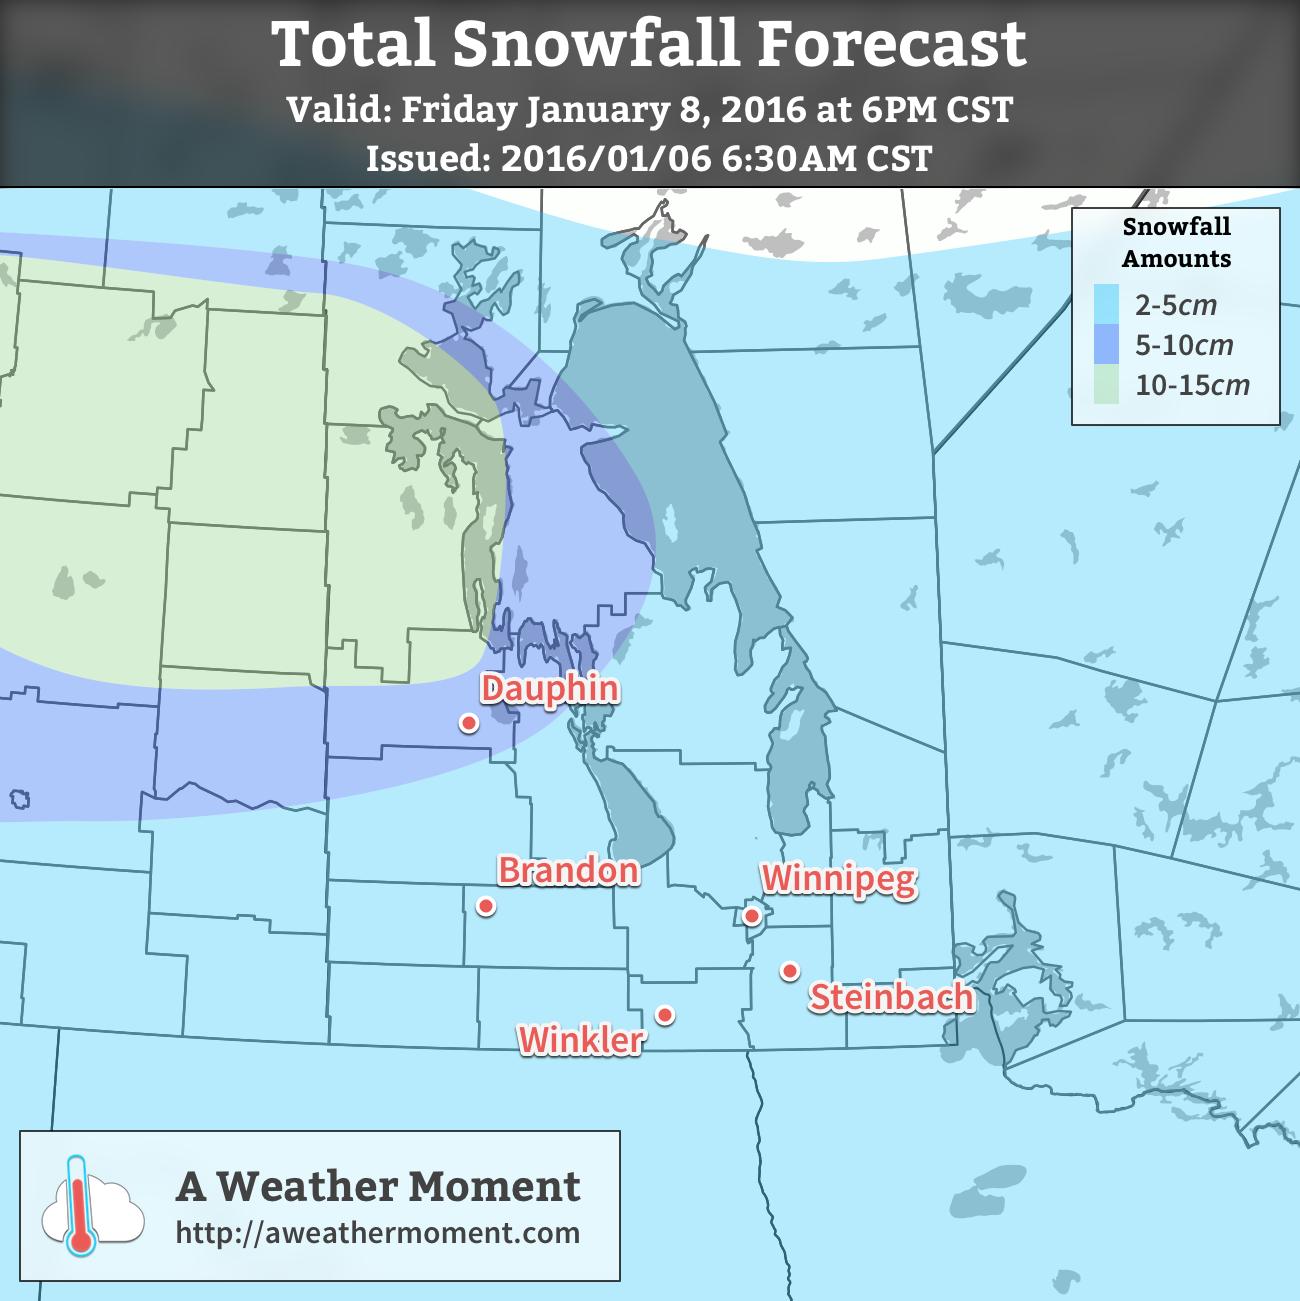 AWM Snowfall Forecast for January 7-8, 2016